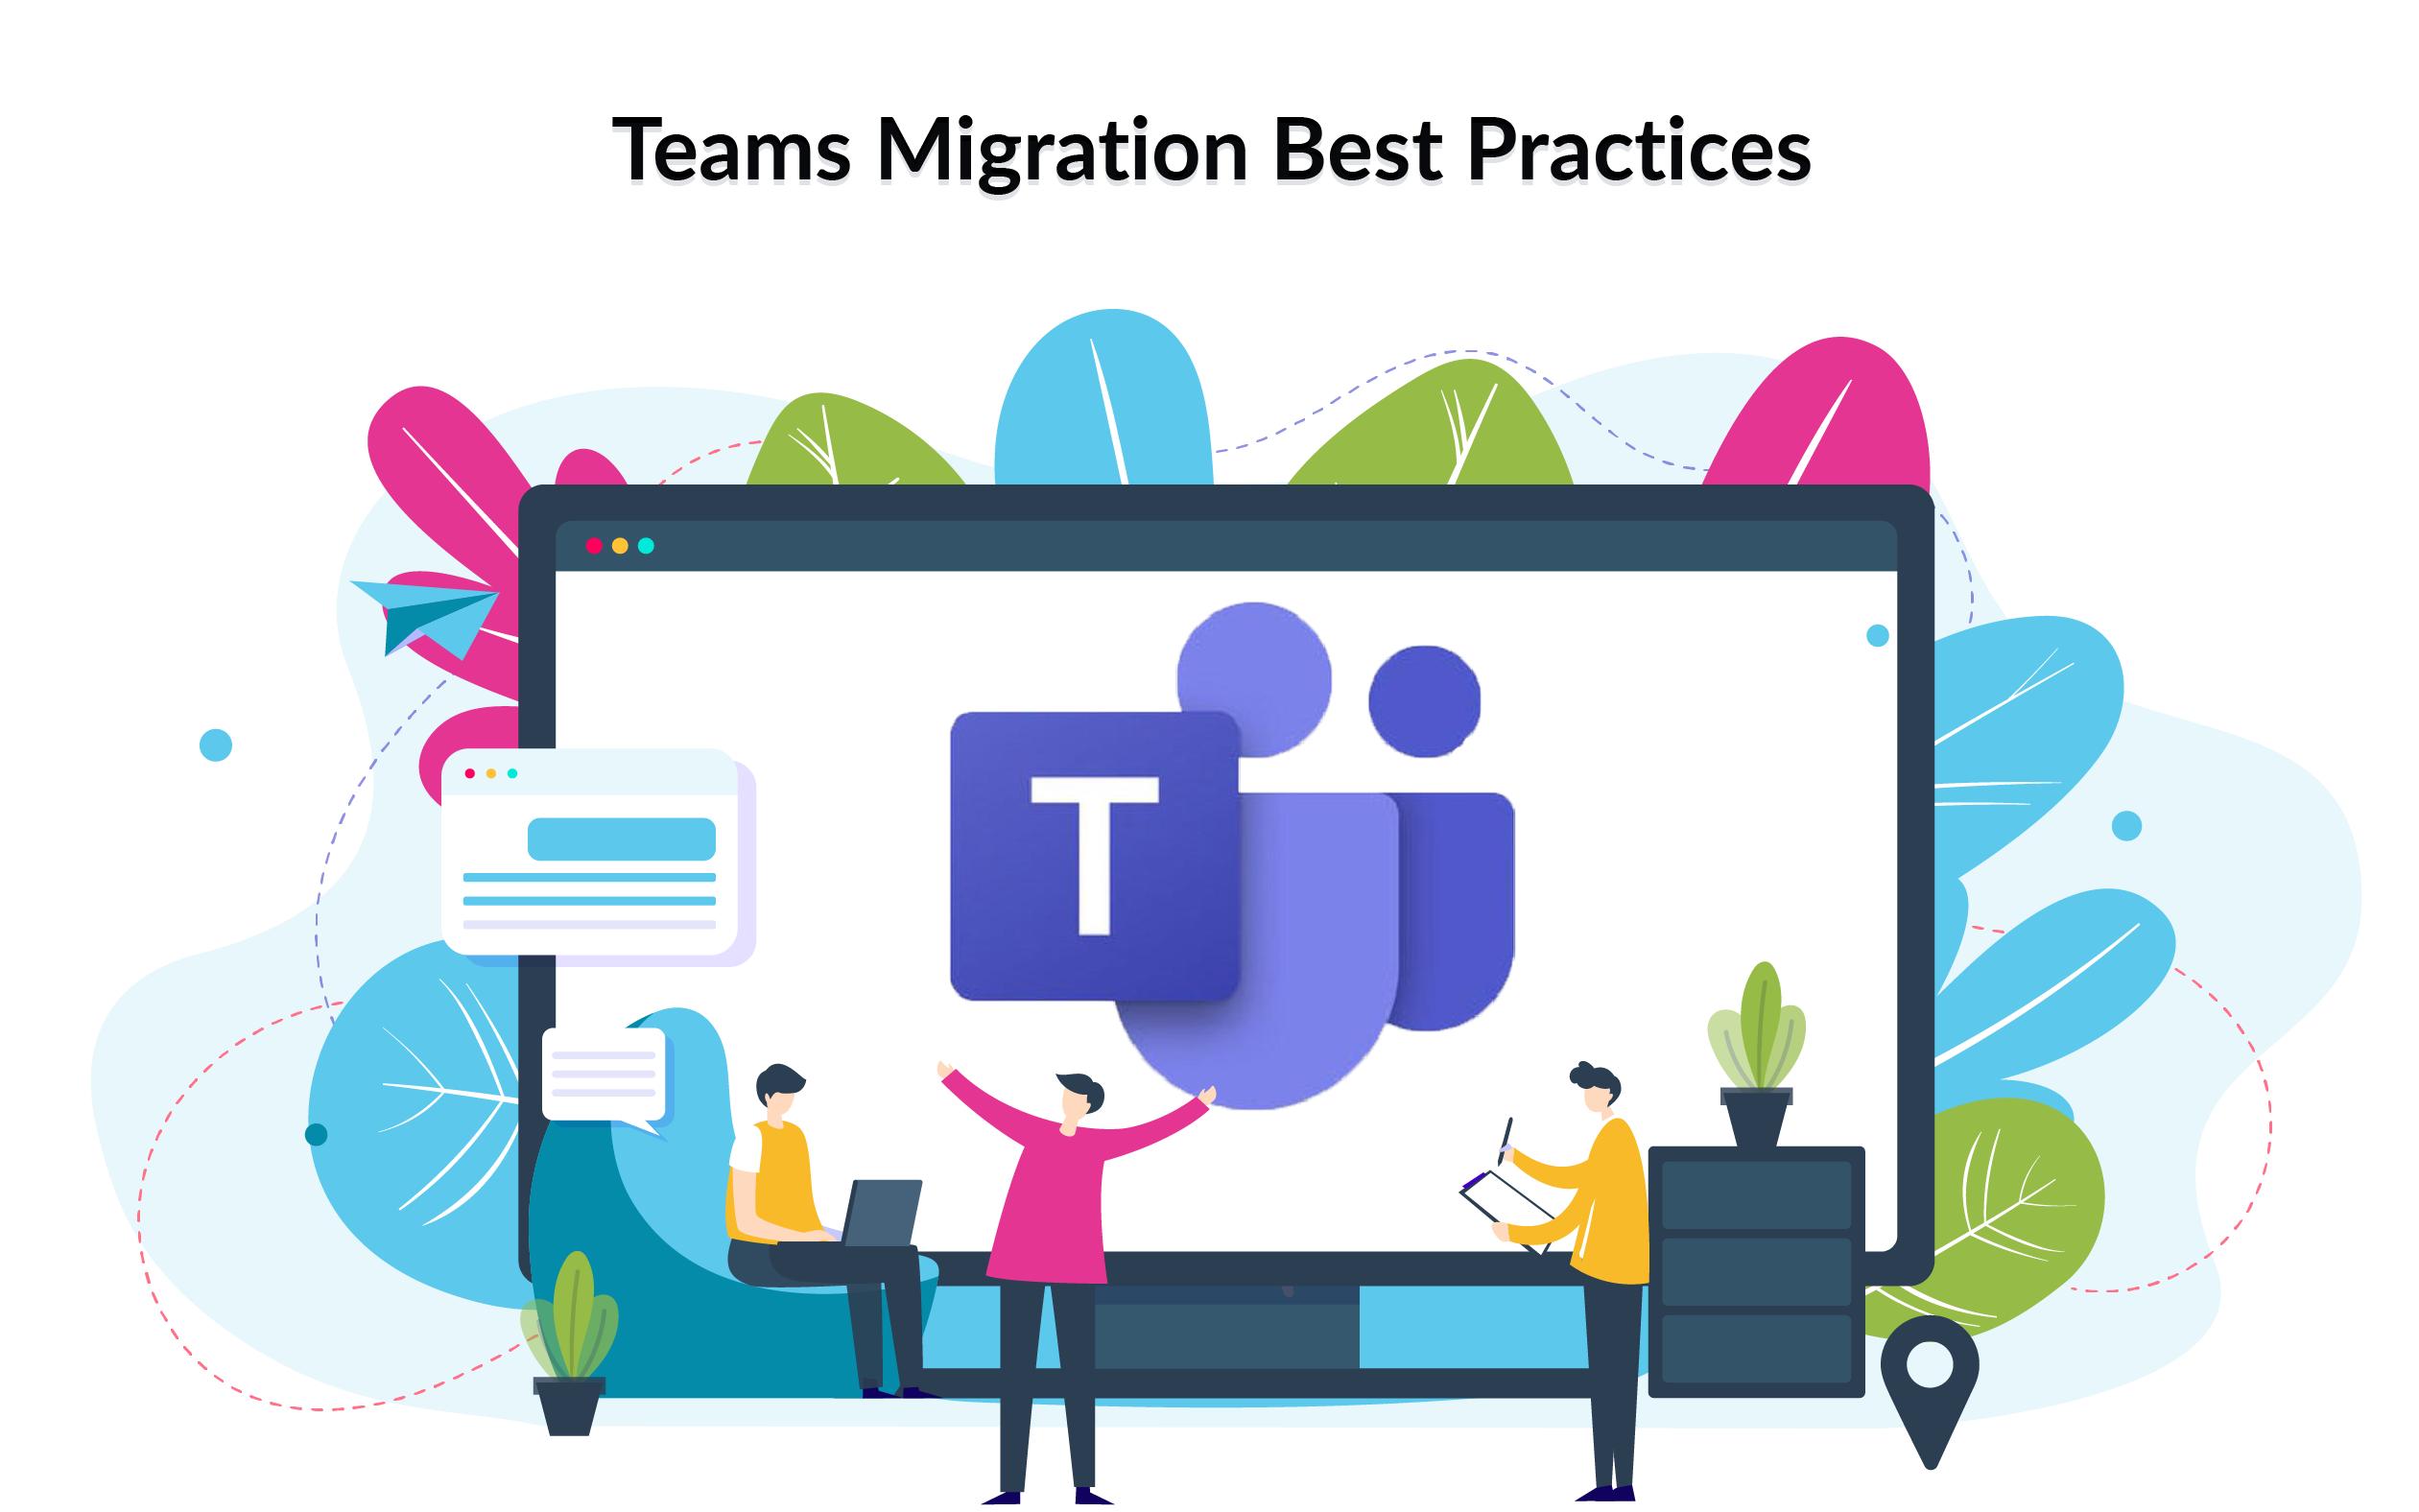 Teams migration best practices